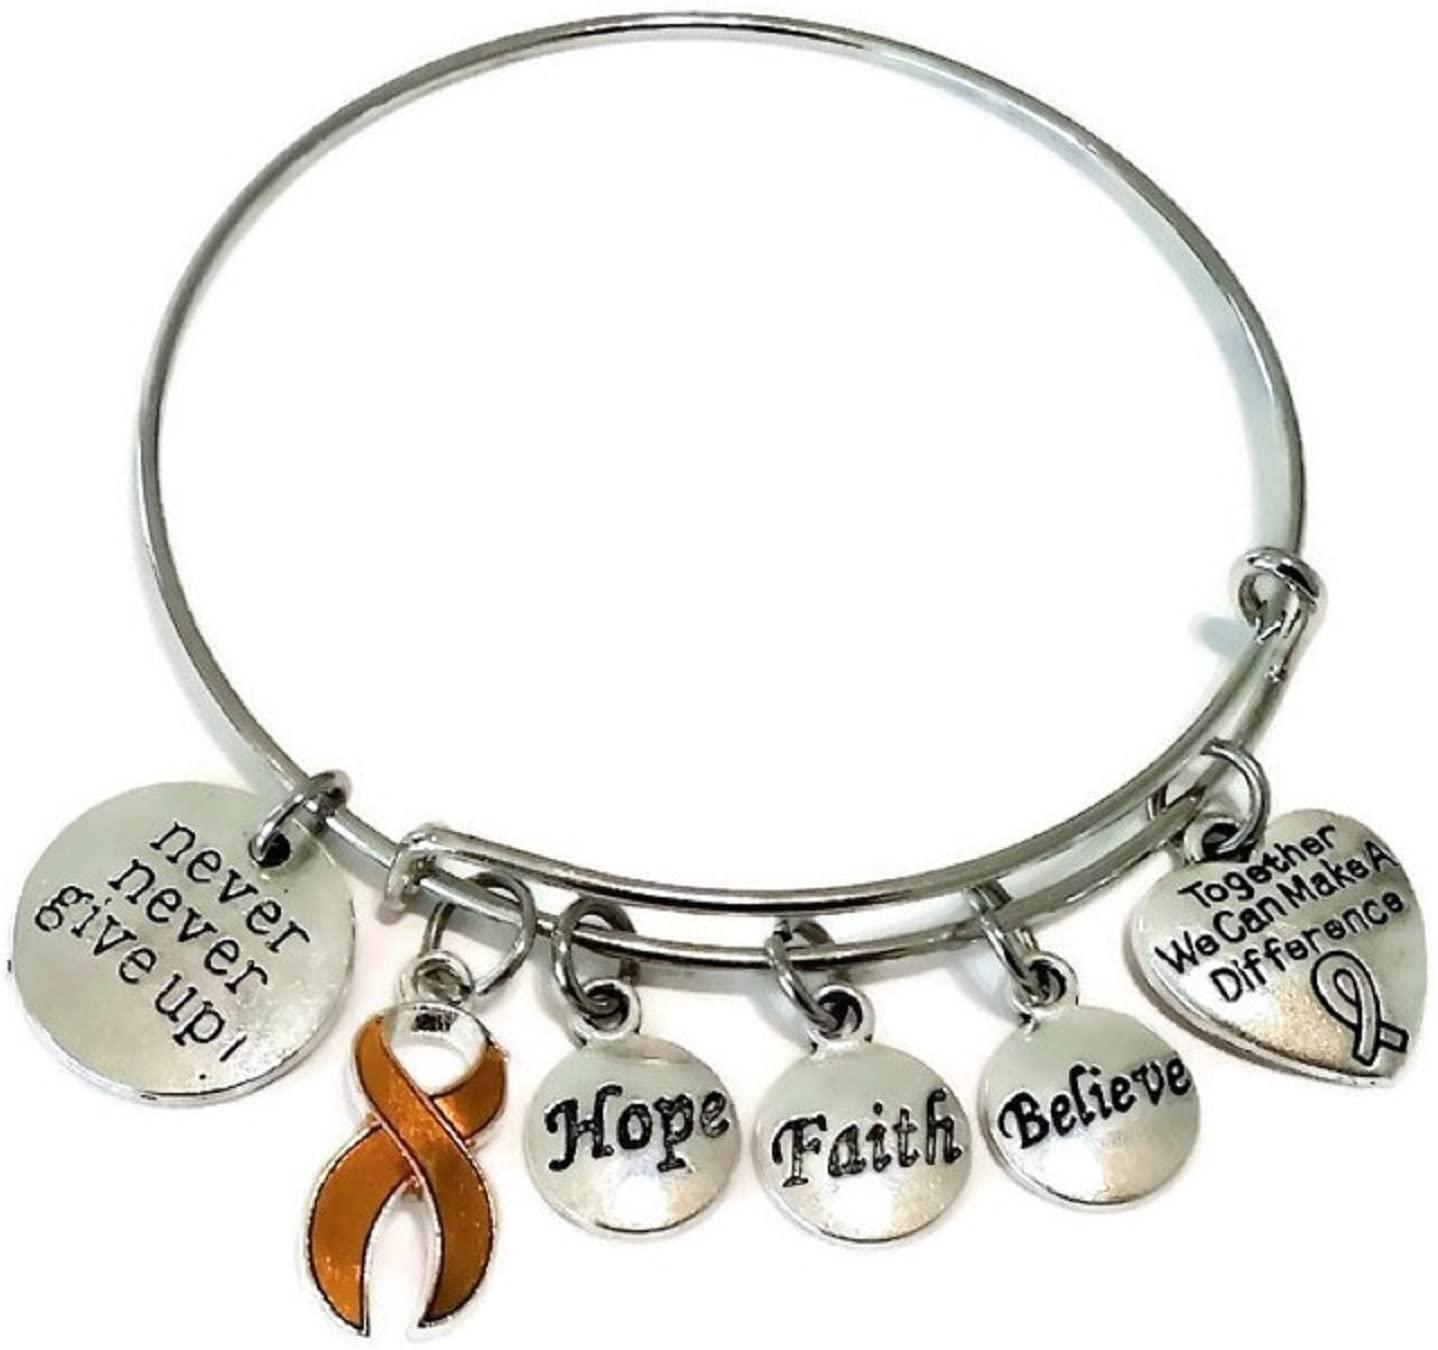 Kit's Kiss Orange Ribbon Bracelet, Orange Ribbon Jewelry, Cancer Awareness Jewelry, Leukemia Awareness Bracelet, Kidney Cancer Bracelet, MS Awareness, ADHD, Orange Ribbon Bangle Bracelet